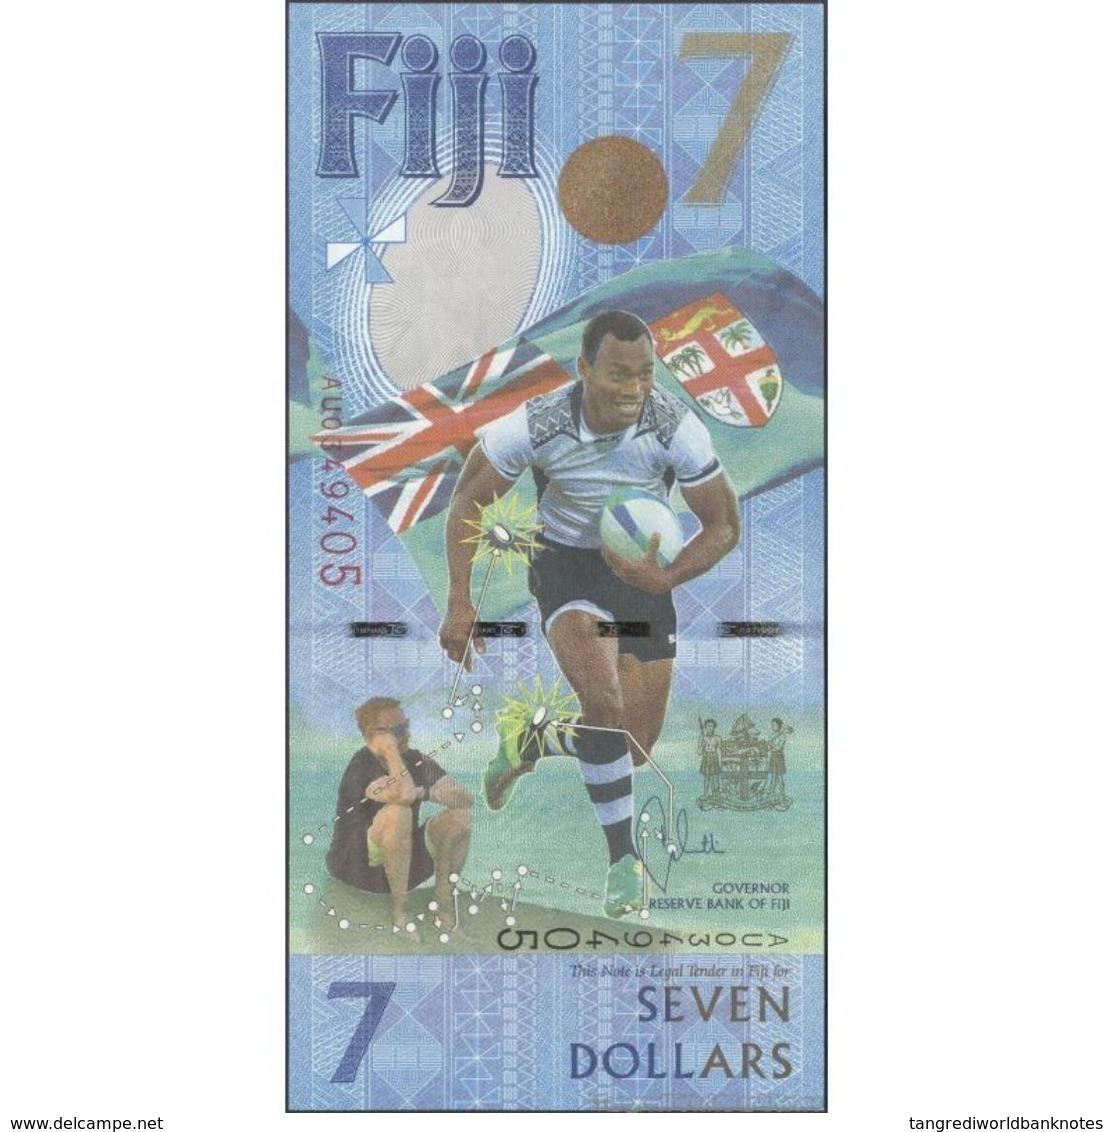 TWN - FIJI ISLANDS NEW - 7 Dollars 2017 - 2016 Fiji Rugby 7s Gold Medal Win - Prefix AU - Signature: Whiteside UNC - Figi